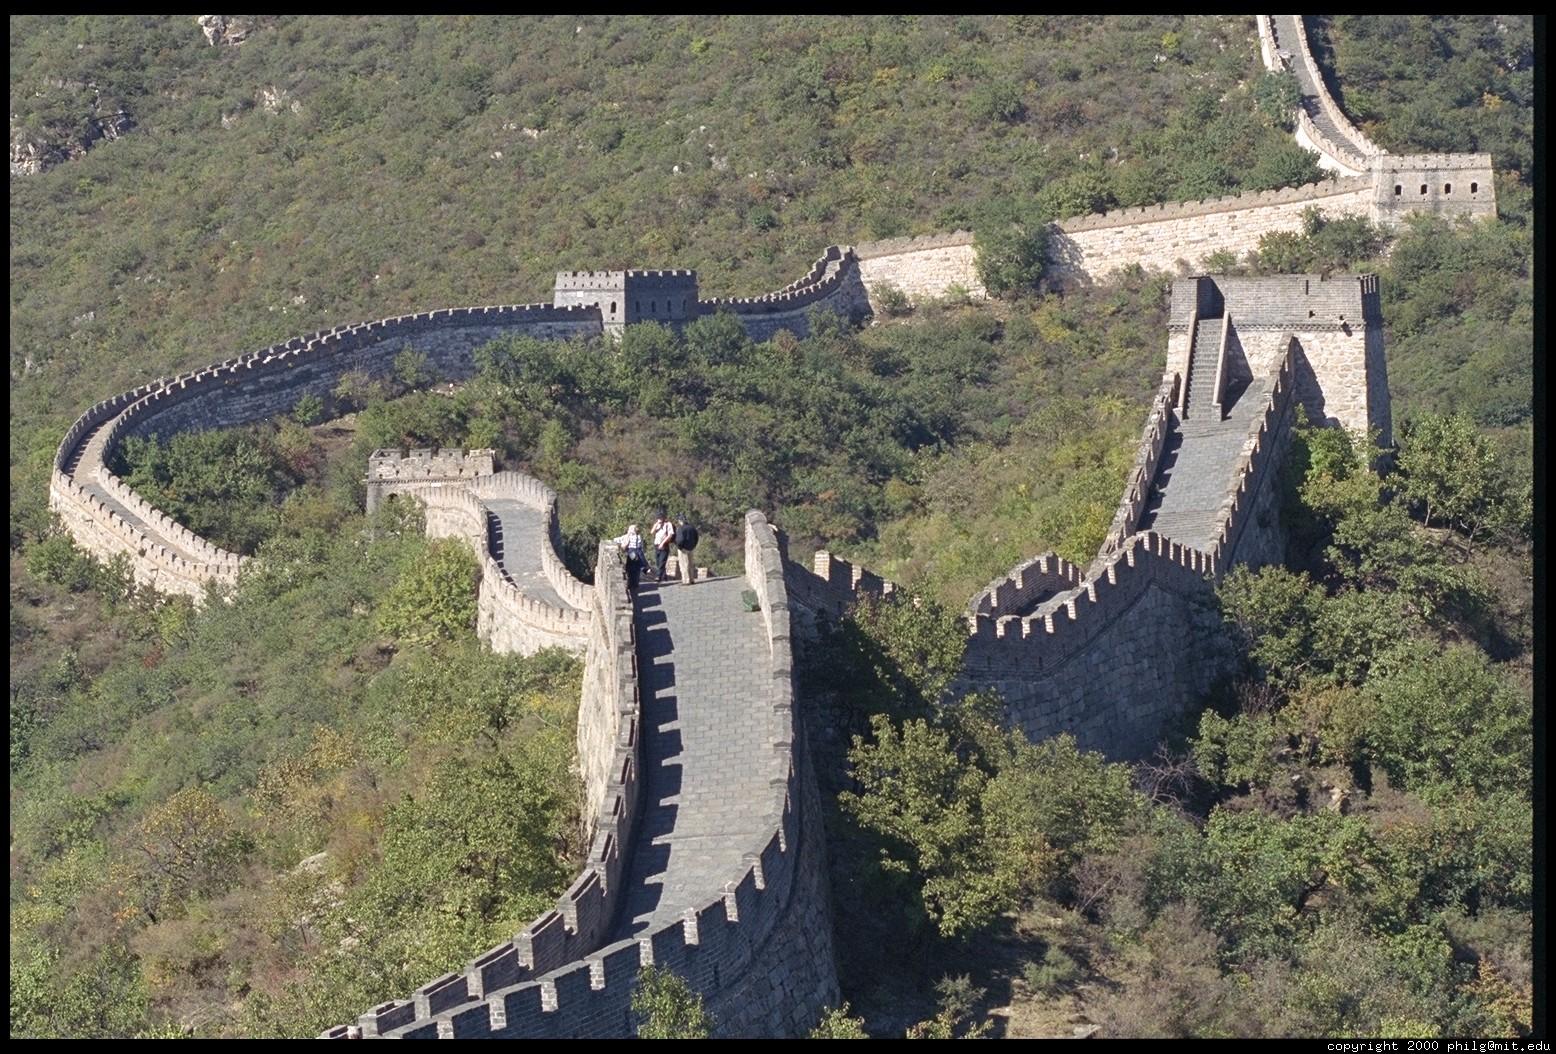 http://1.bp.blogspot.com/-gNFThLAczgI/Ttiy_TaZHrI/AAAAAAAAF1w/Q7ZUgiOORQY/s1600/great_wall_of_china_wallpaper_wonders_architecture_.jpg